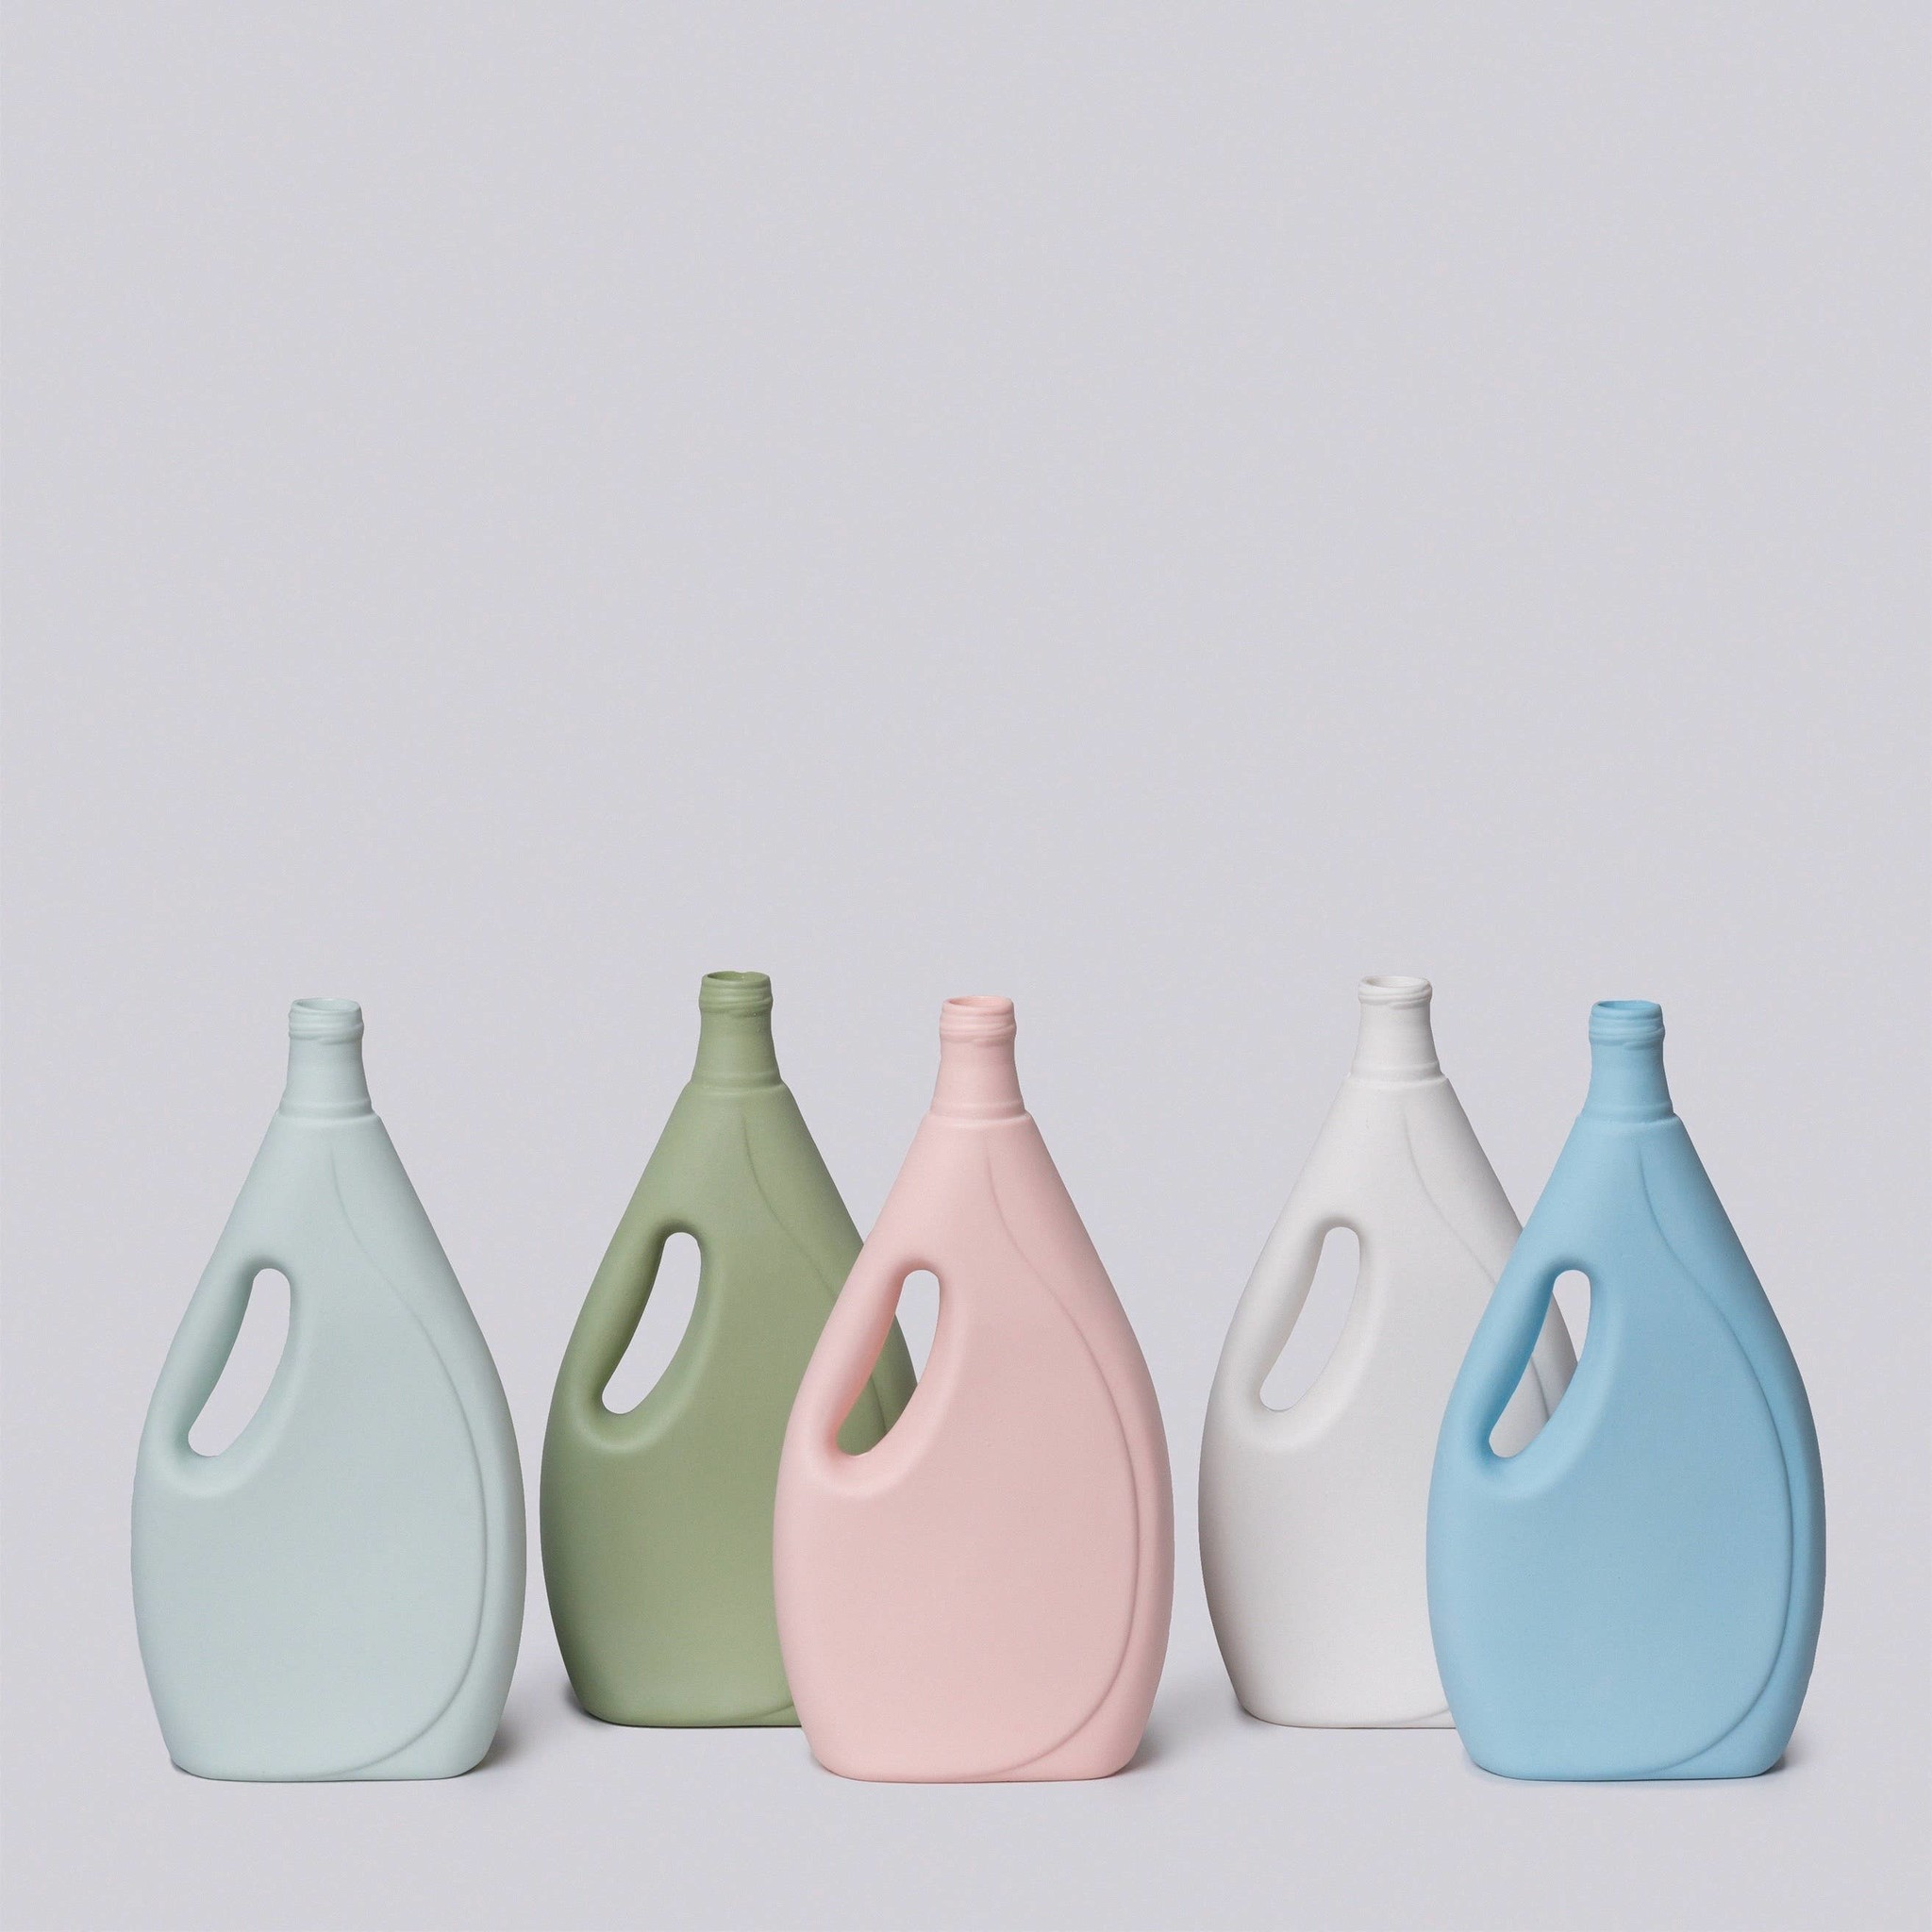 Laundry Detergent Bottle Vase-2